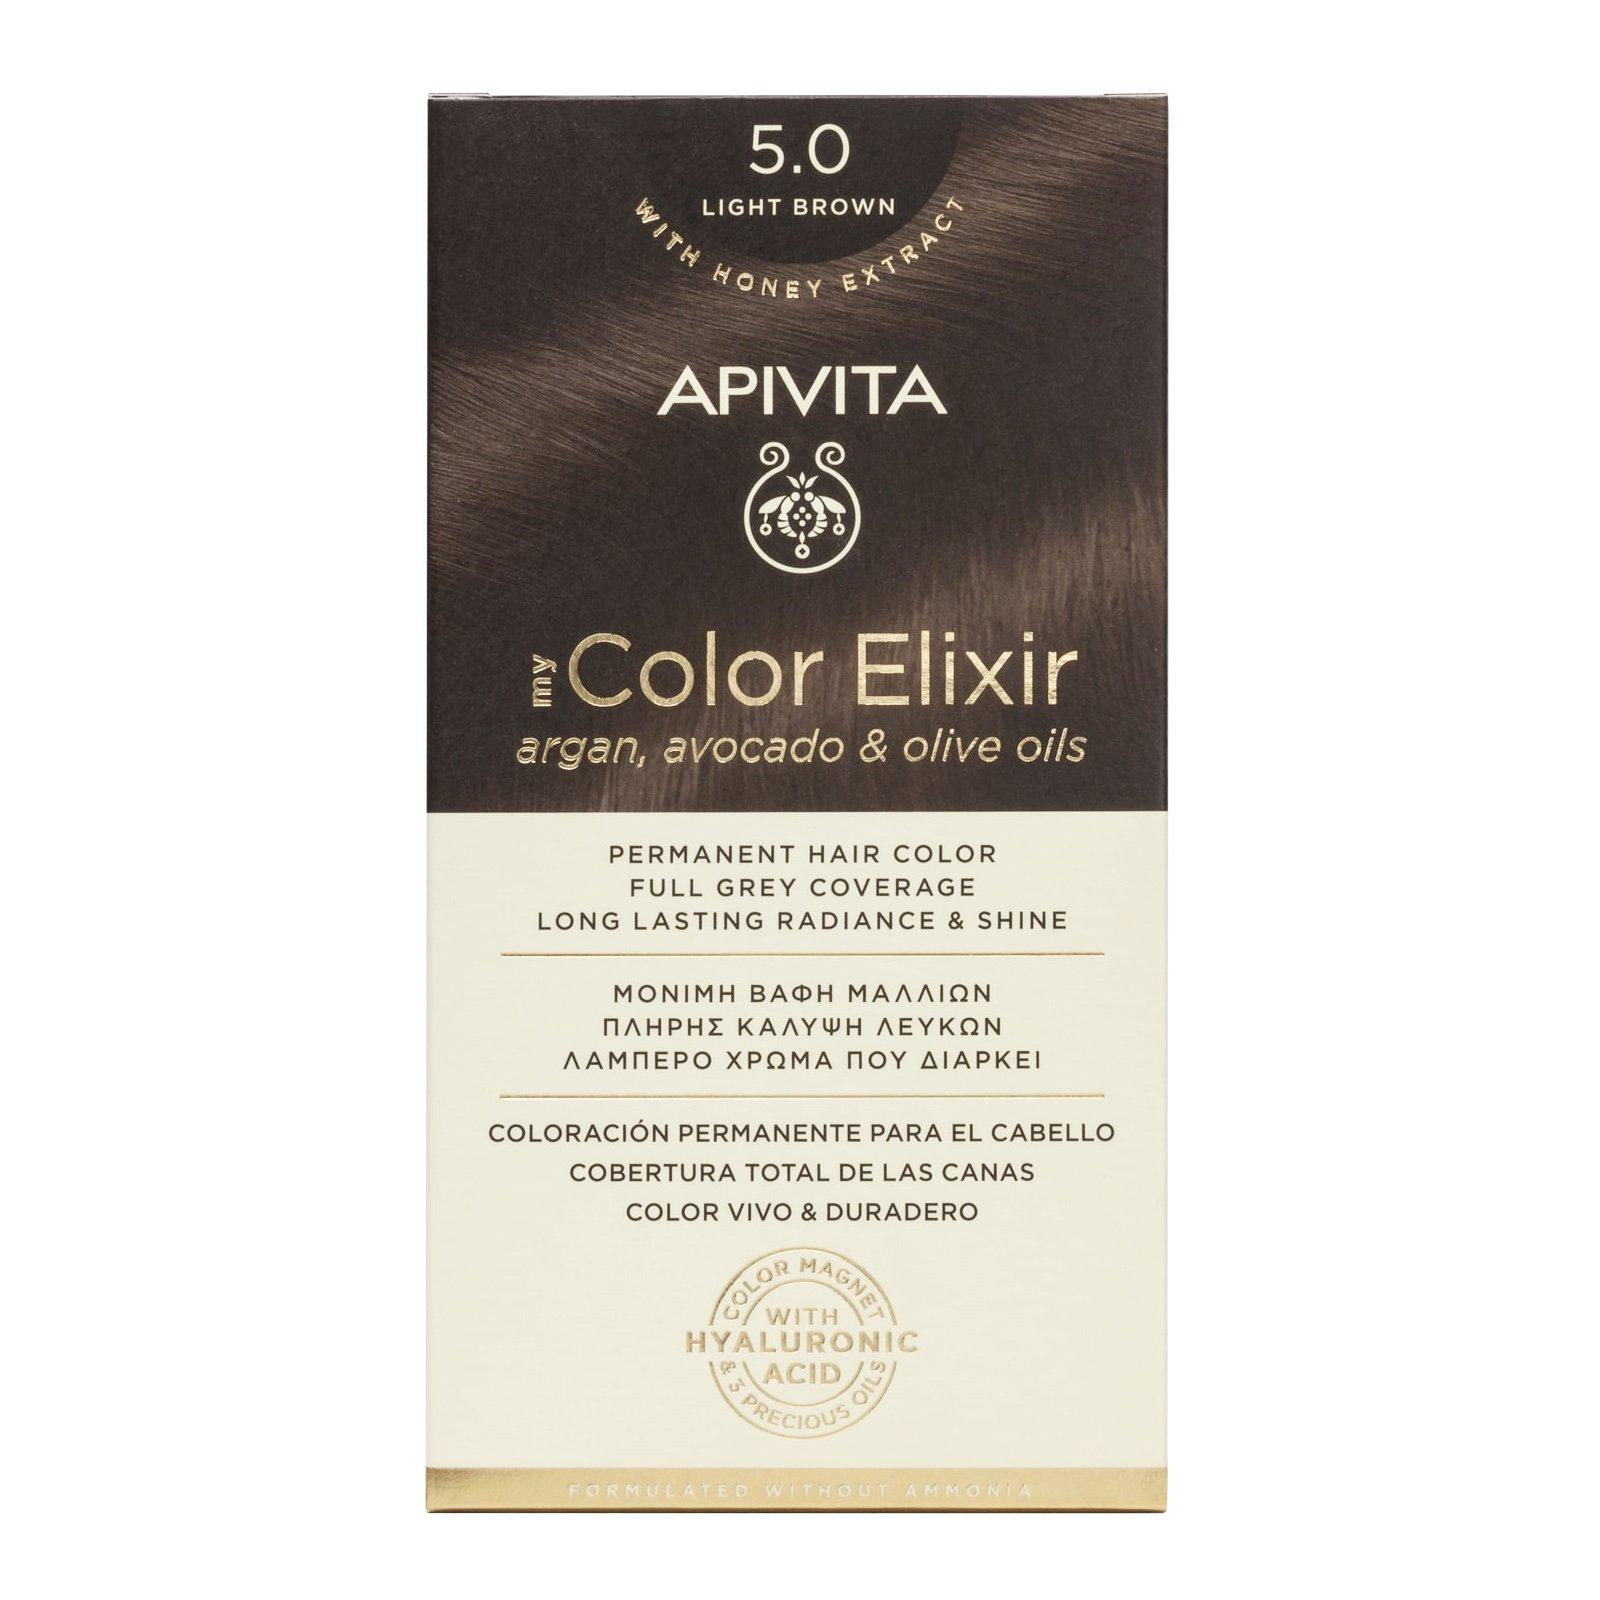 Apivita My Color Elixir Μόνιμη Βαφή Μαλλιών με Καινοτόμο Σύστημα Color Magnet που Σταθεροποιεί και Σφραγίζει το Χρώμα στην Τρίχα – N 5.0 ΚΑΣΤΑΝΟ ΑΝΟΙΧΤΟ